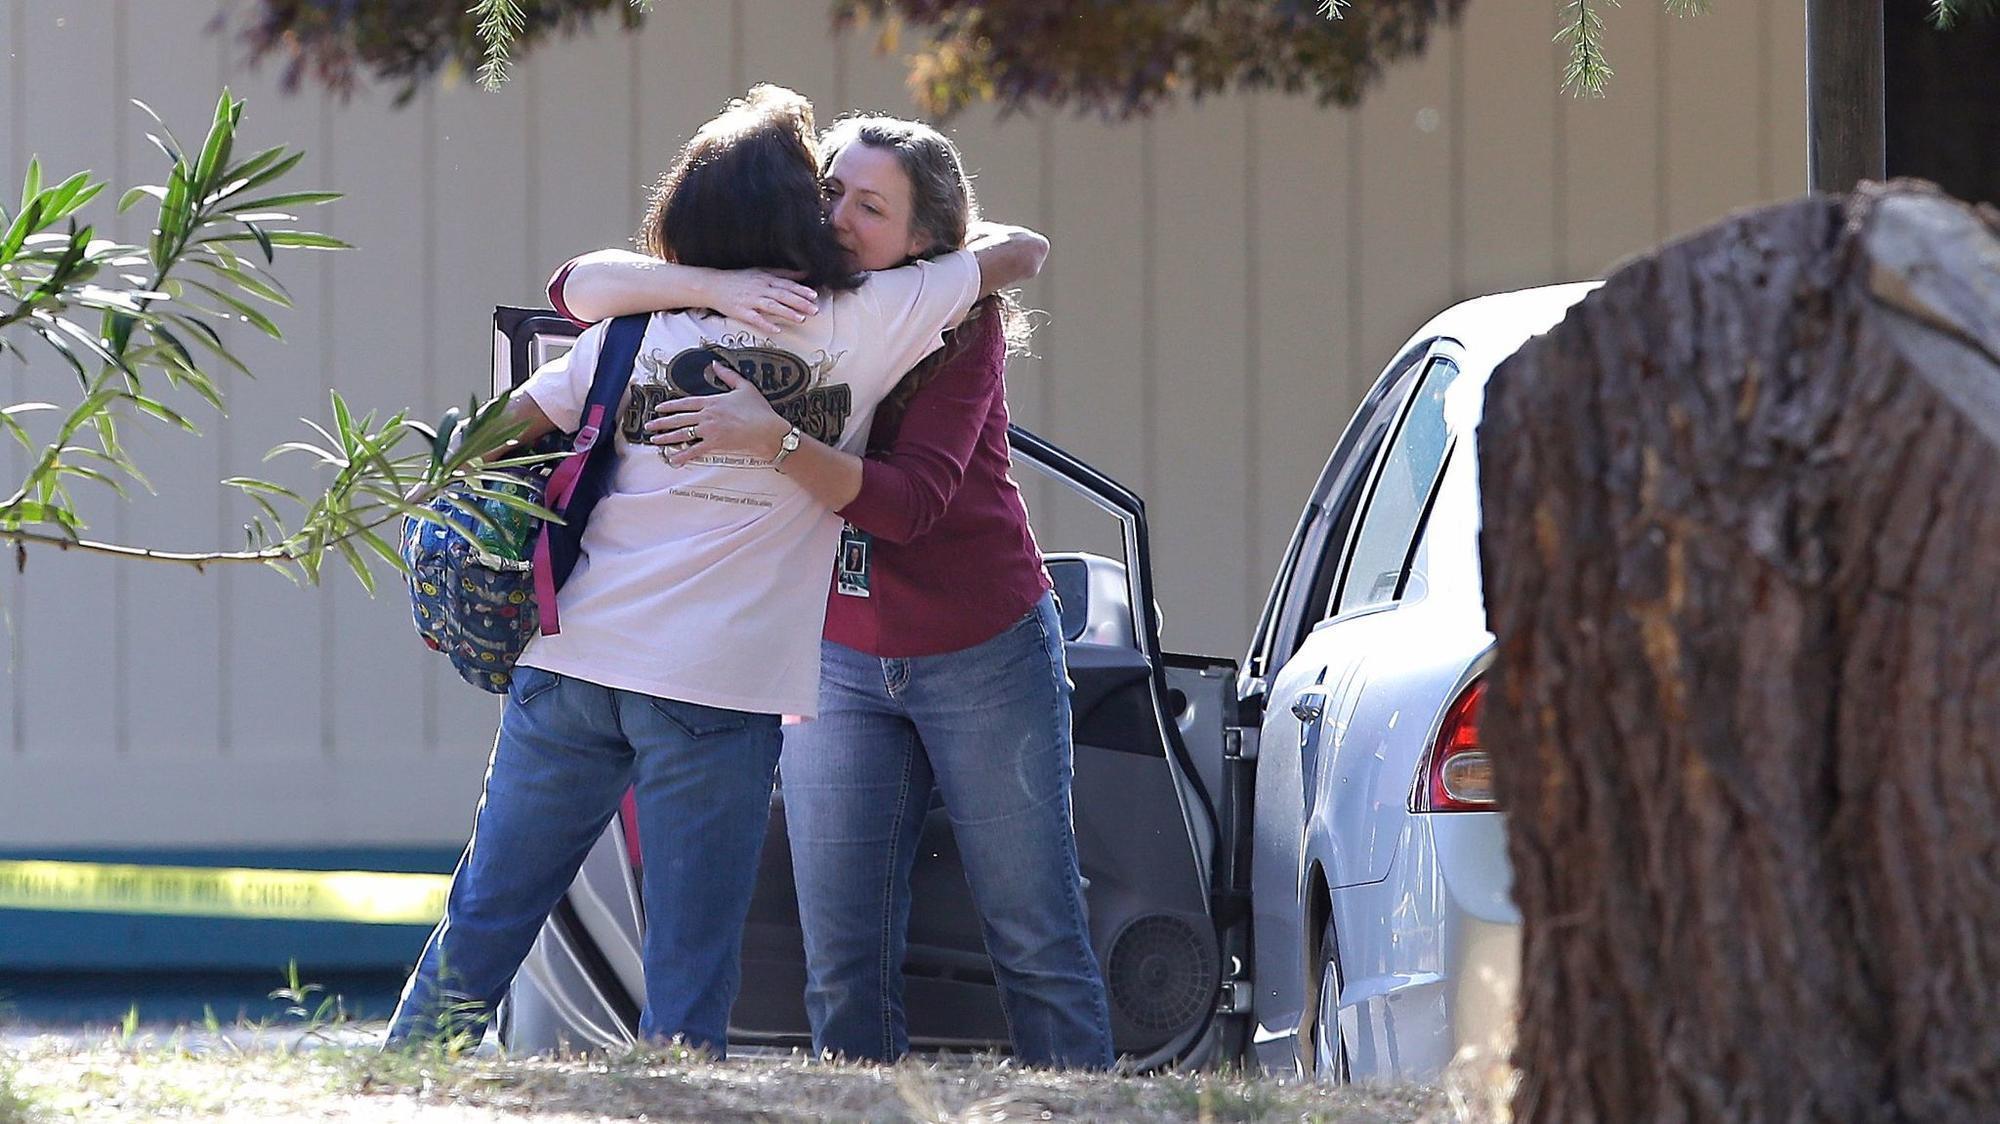 http://beta.latimes.com/local/lanow/la-me-ln-norcal-elementary-school-shooting-20171114-story.html